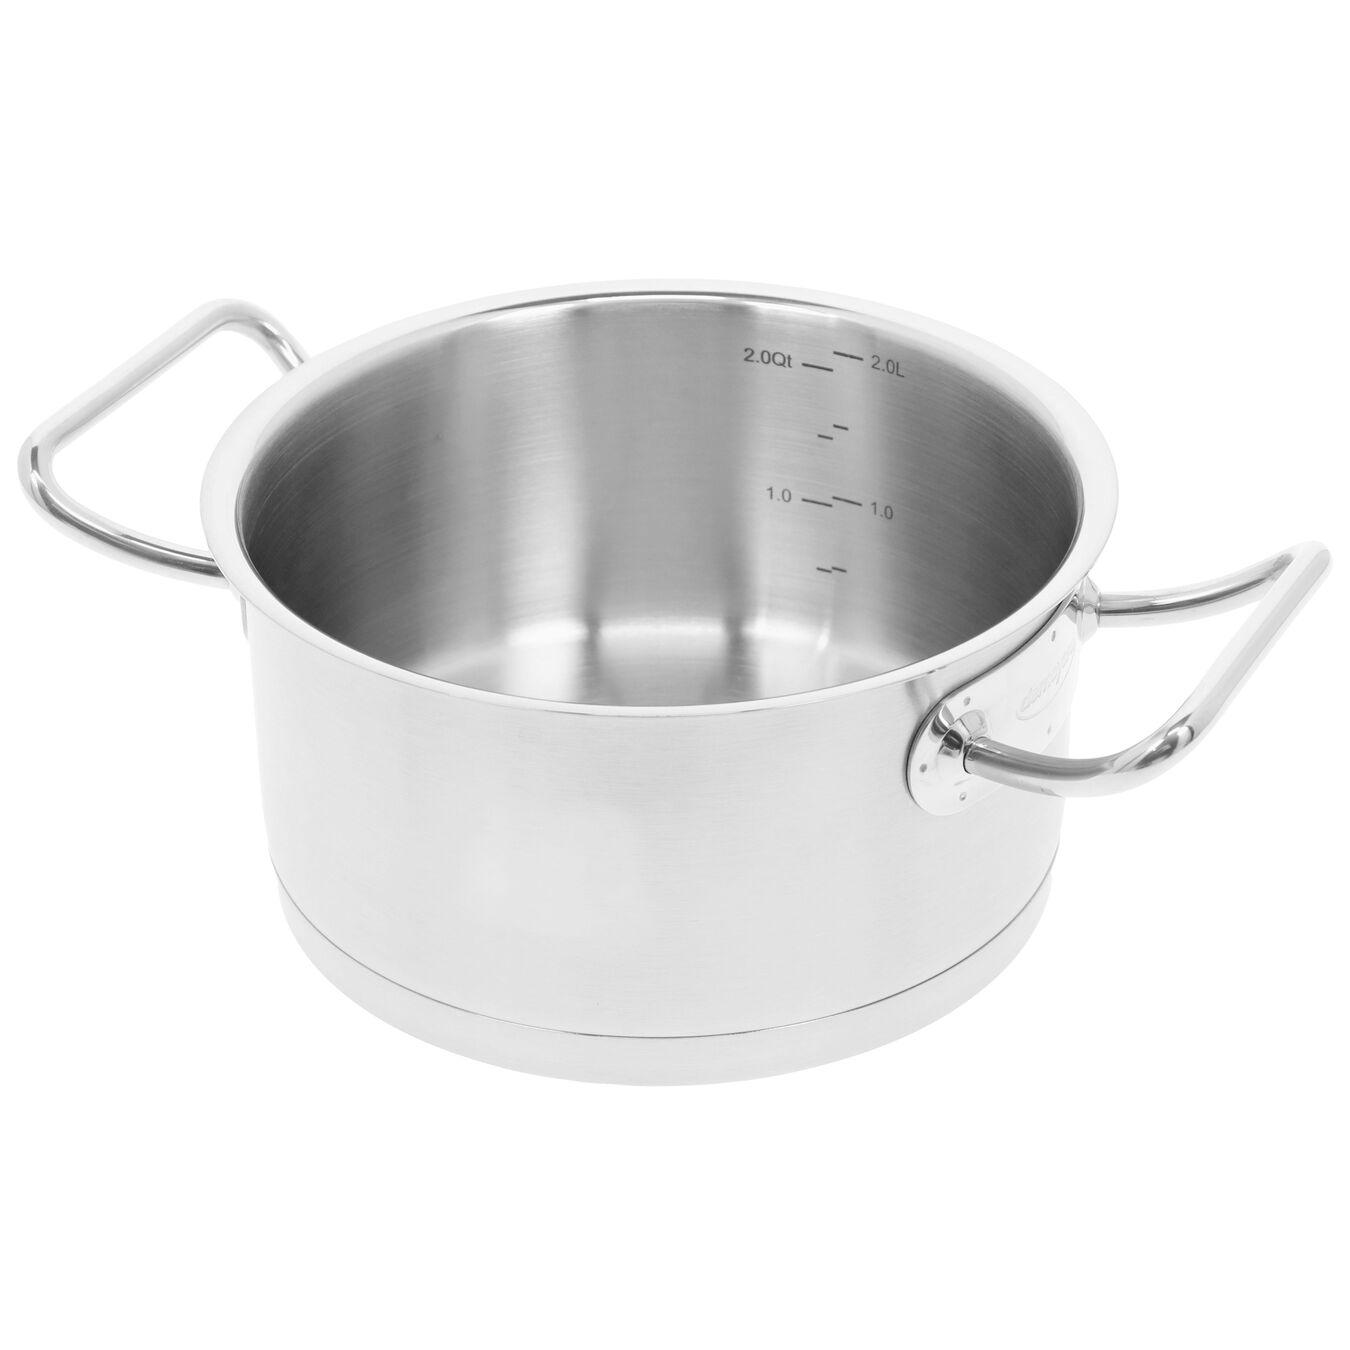 Kookpan met glazen deksel 20 cm / 3 l,,large 6